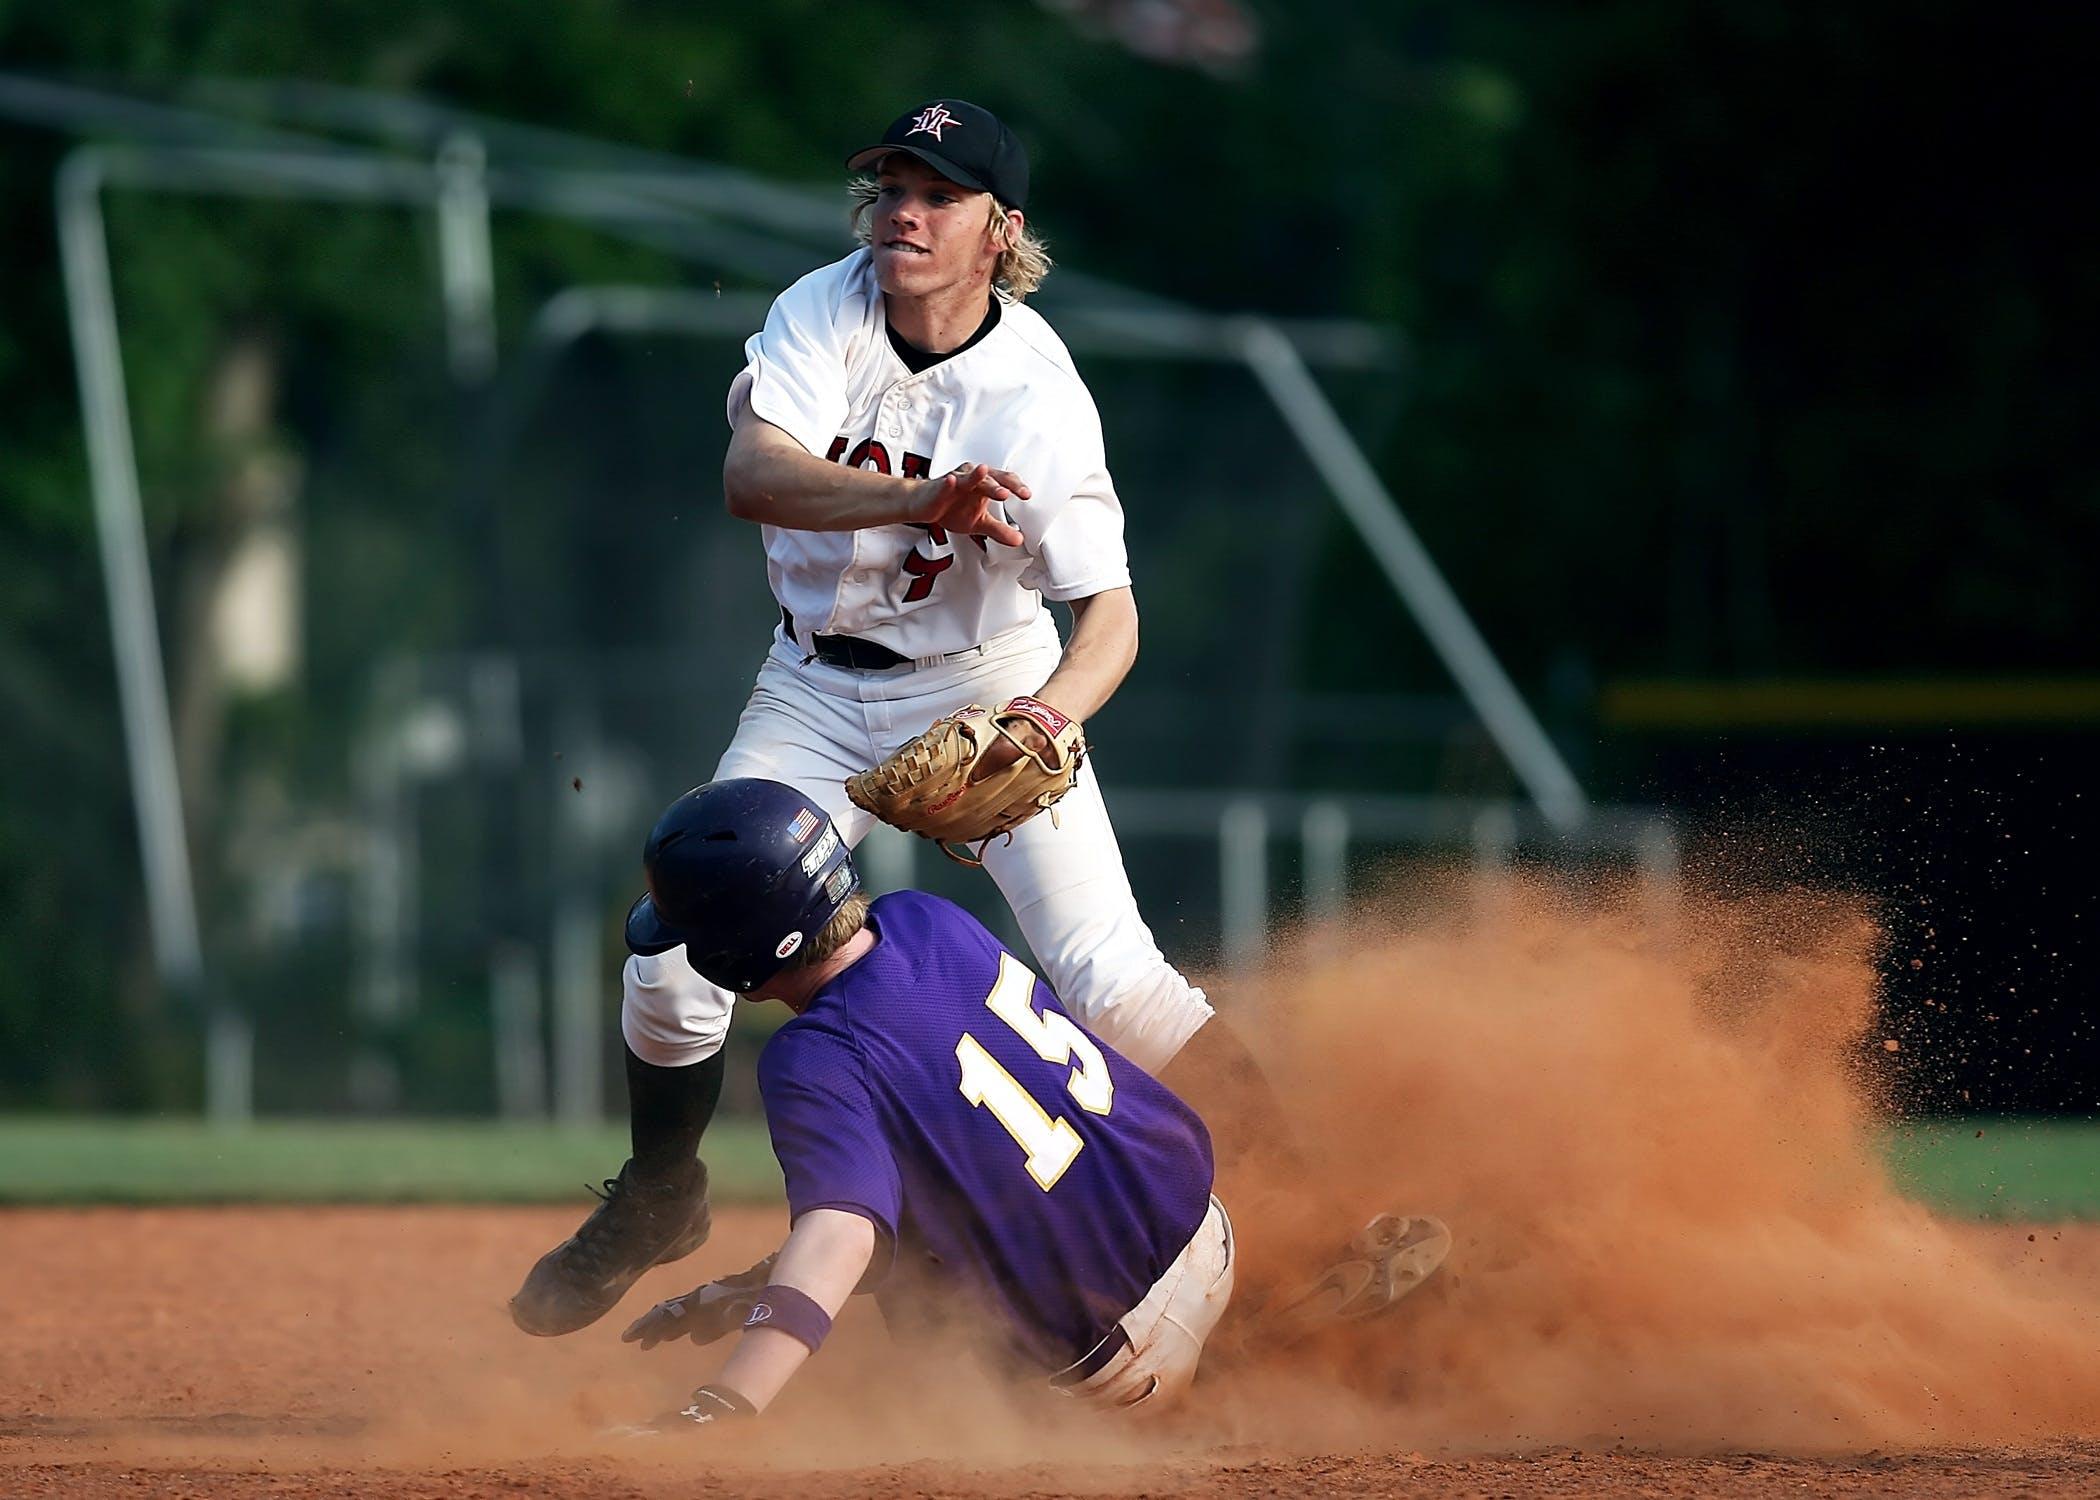 2 Man Playing Baseball on Brown Field